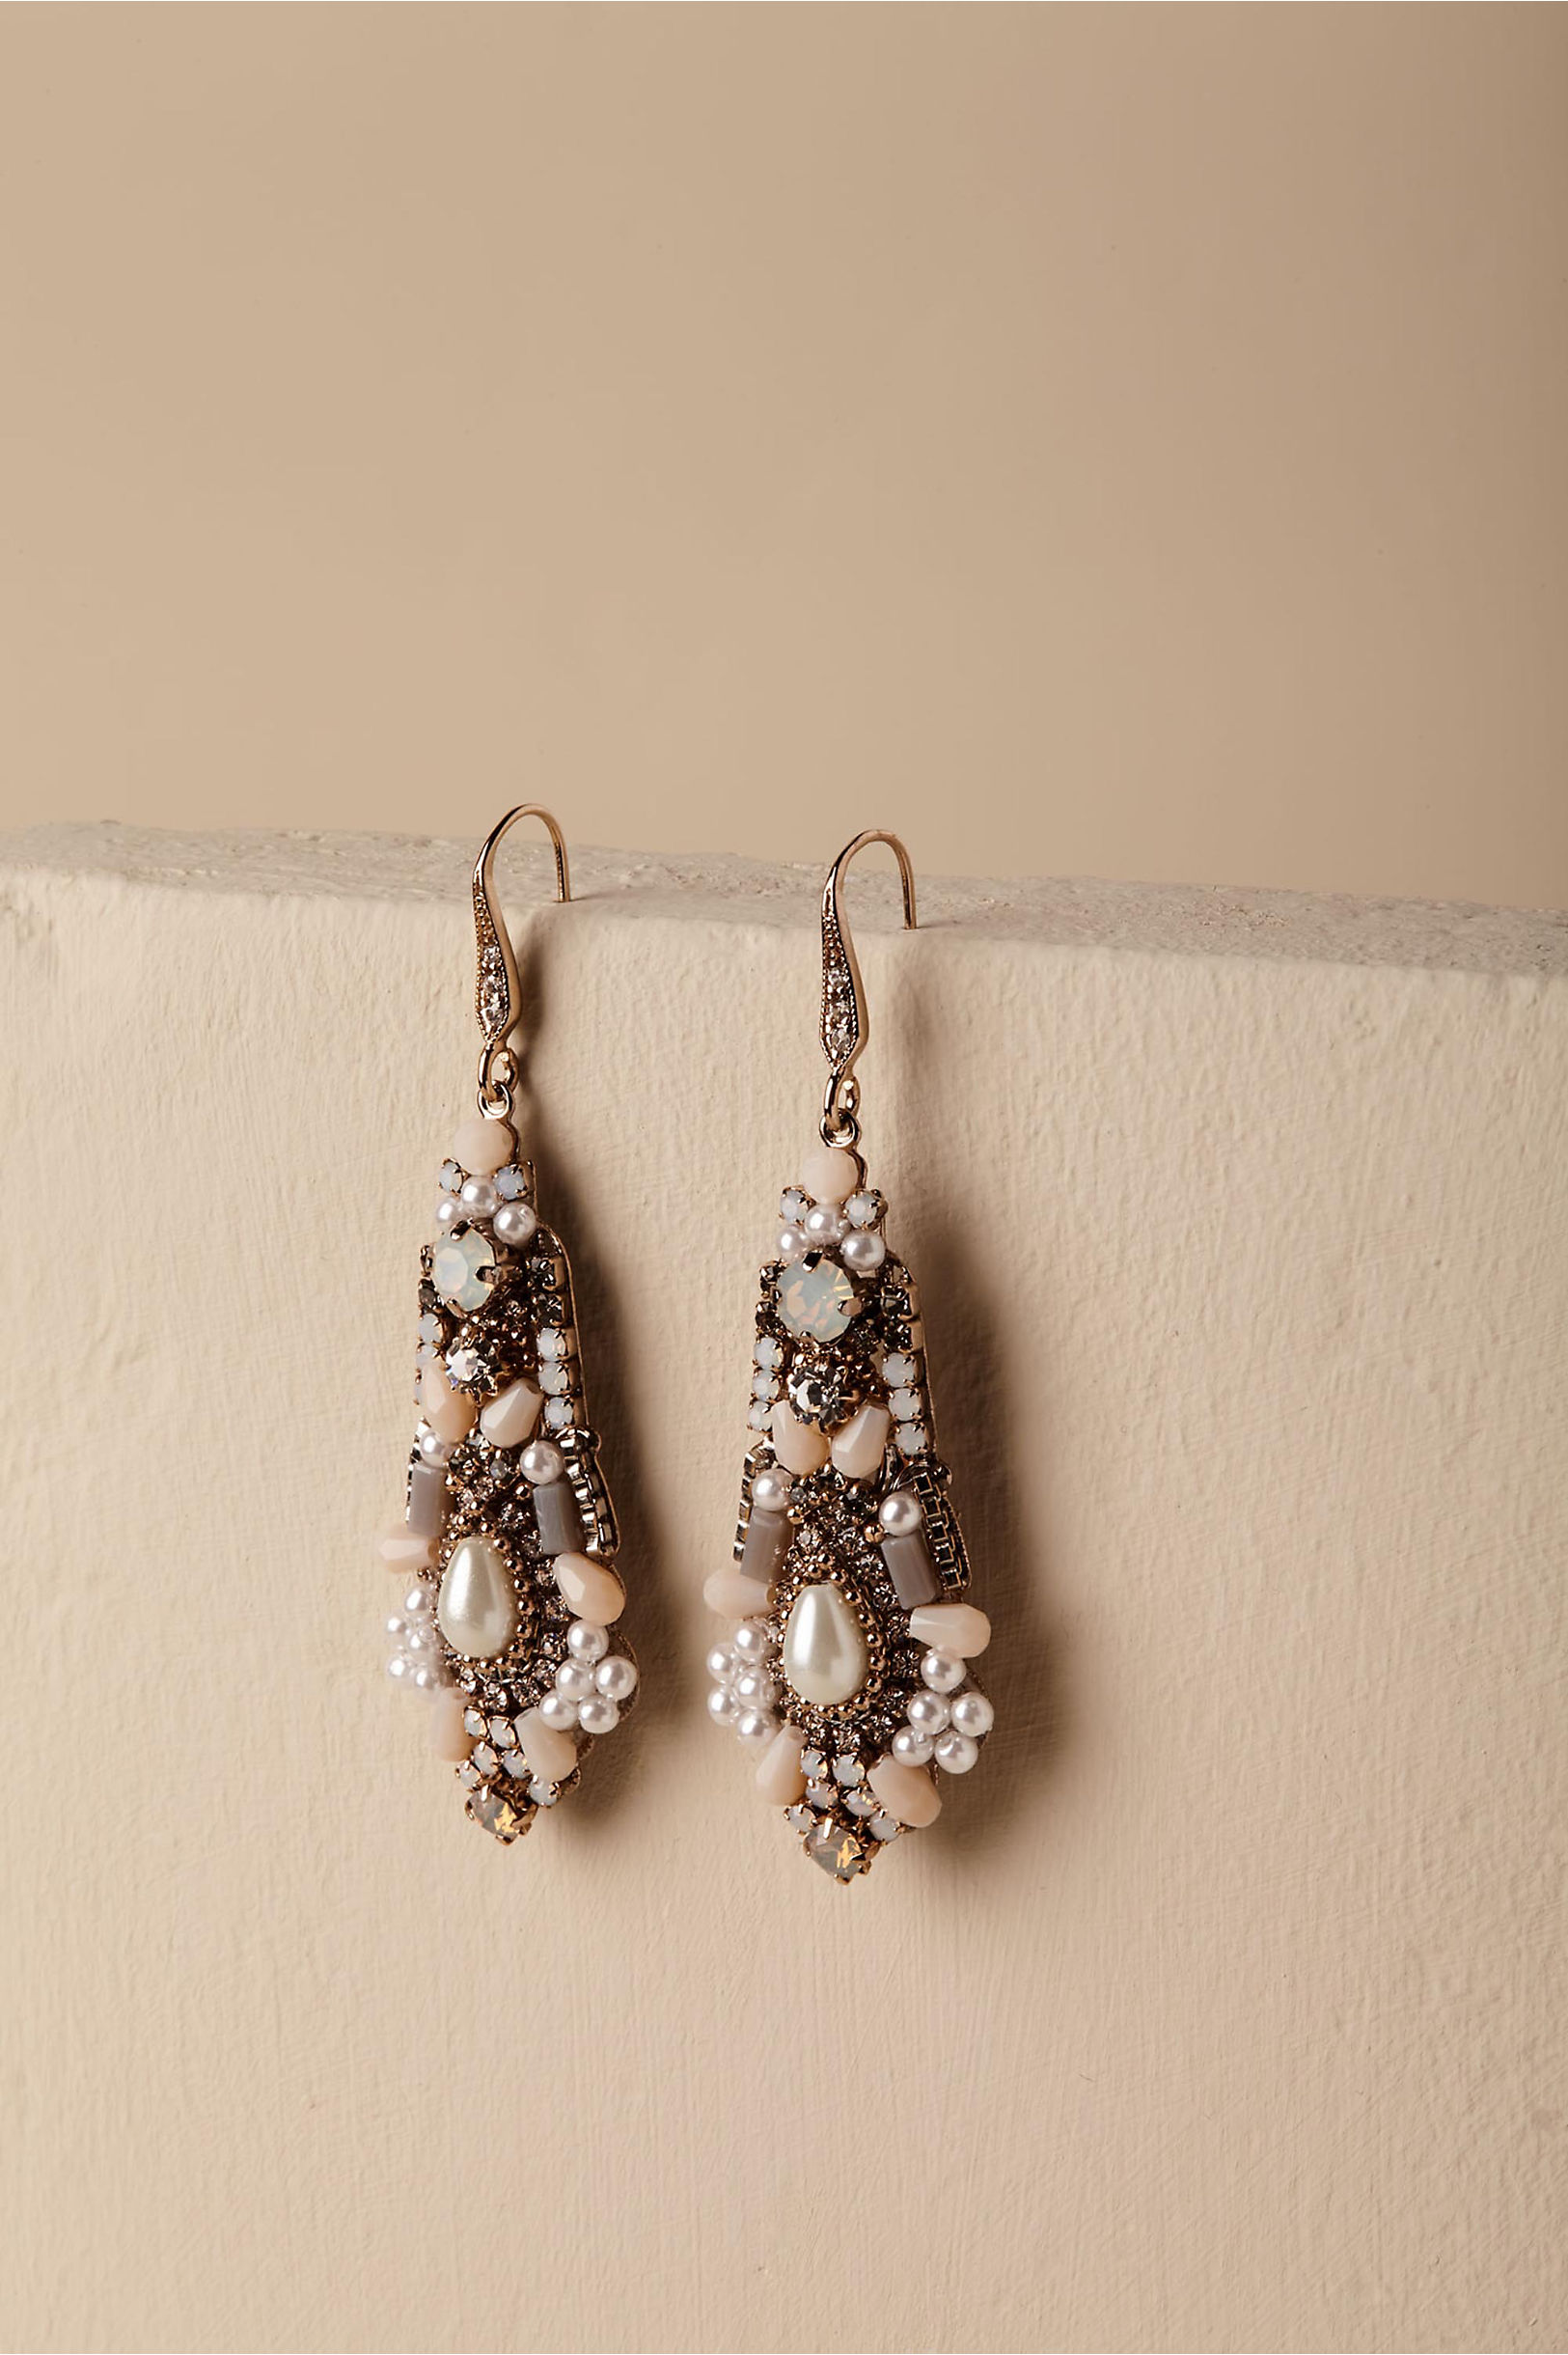 Mita Chandelier Earrings in Sale | BHLDN